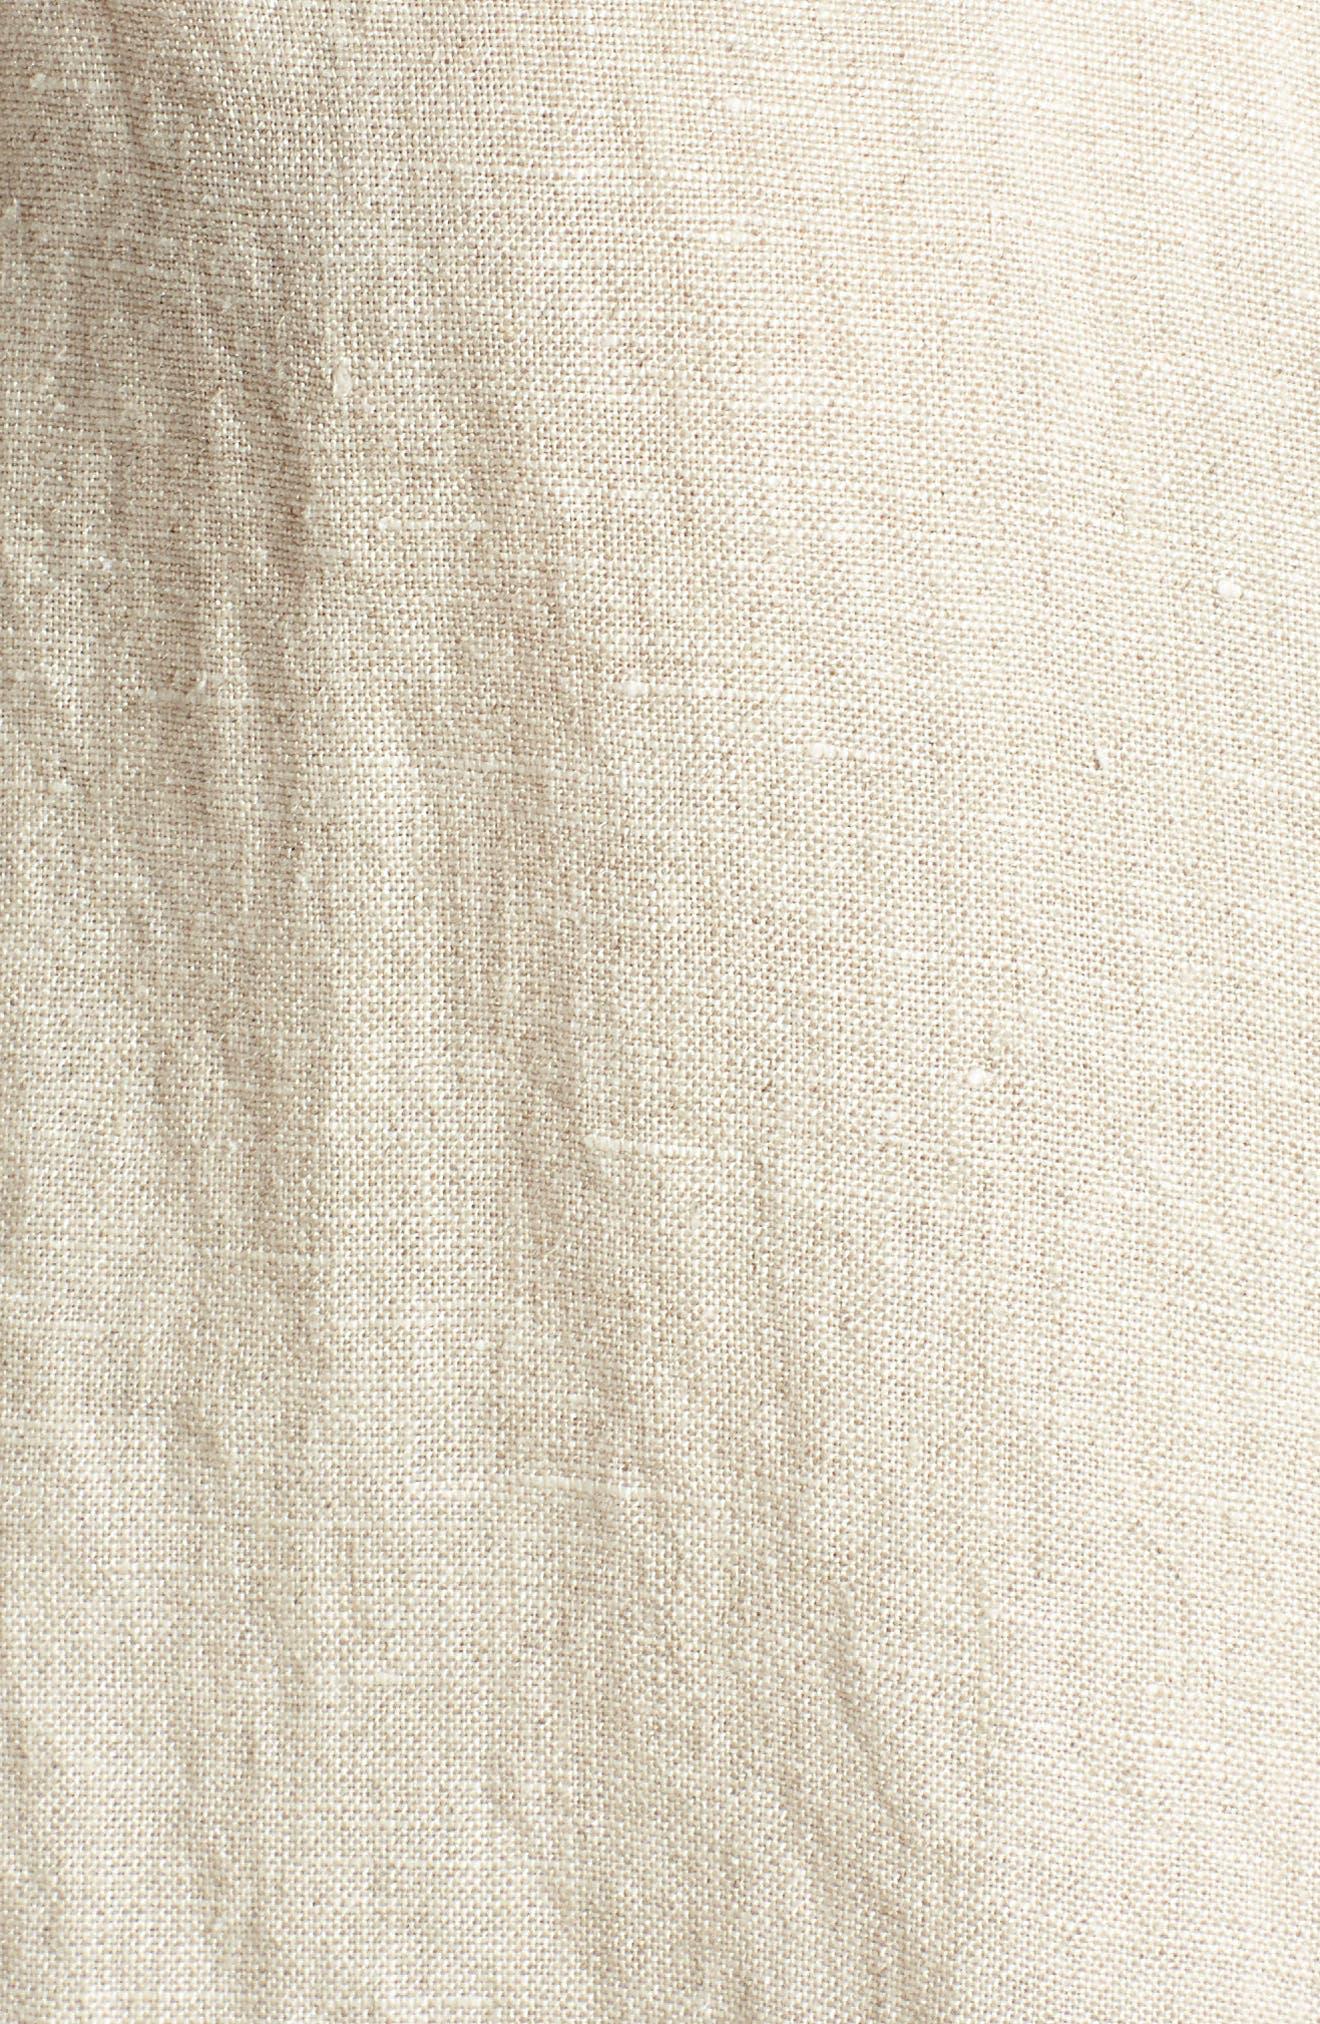 Tie Front Linen Shirt,                             Alternate thumbnail 5, color,                             Flax